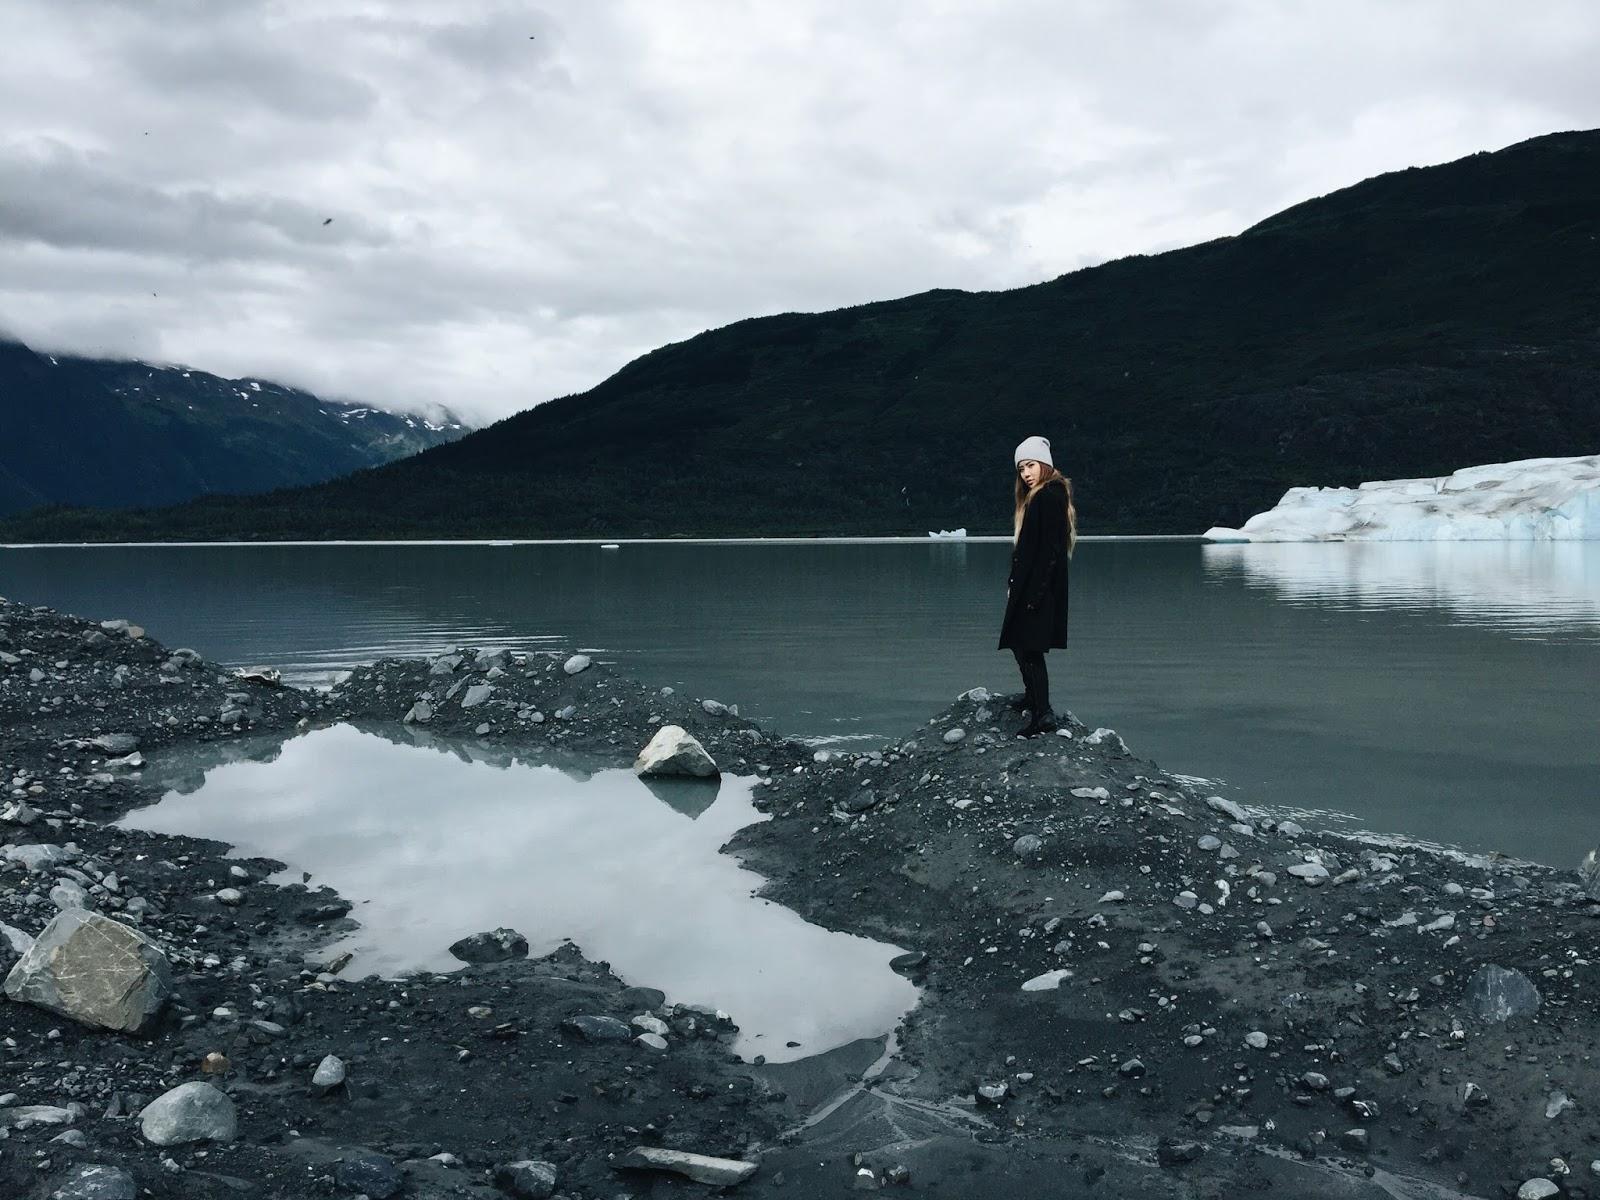 Looking For Alaksa: Instagram Roundup: Looking For Alaska